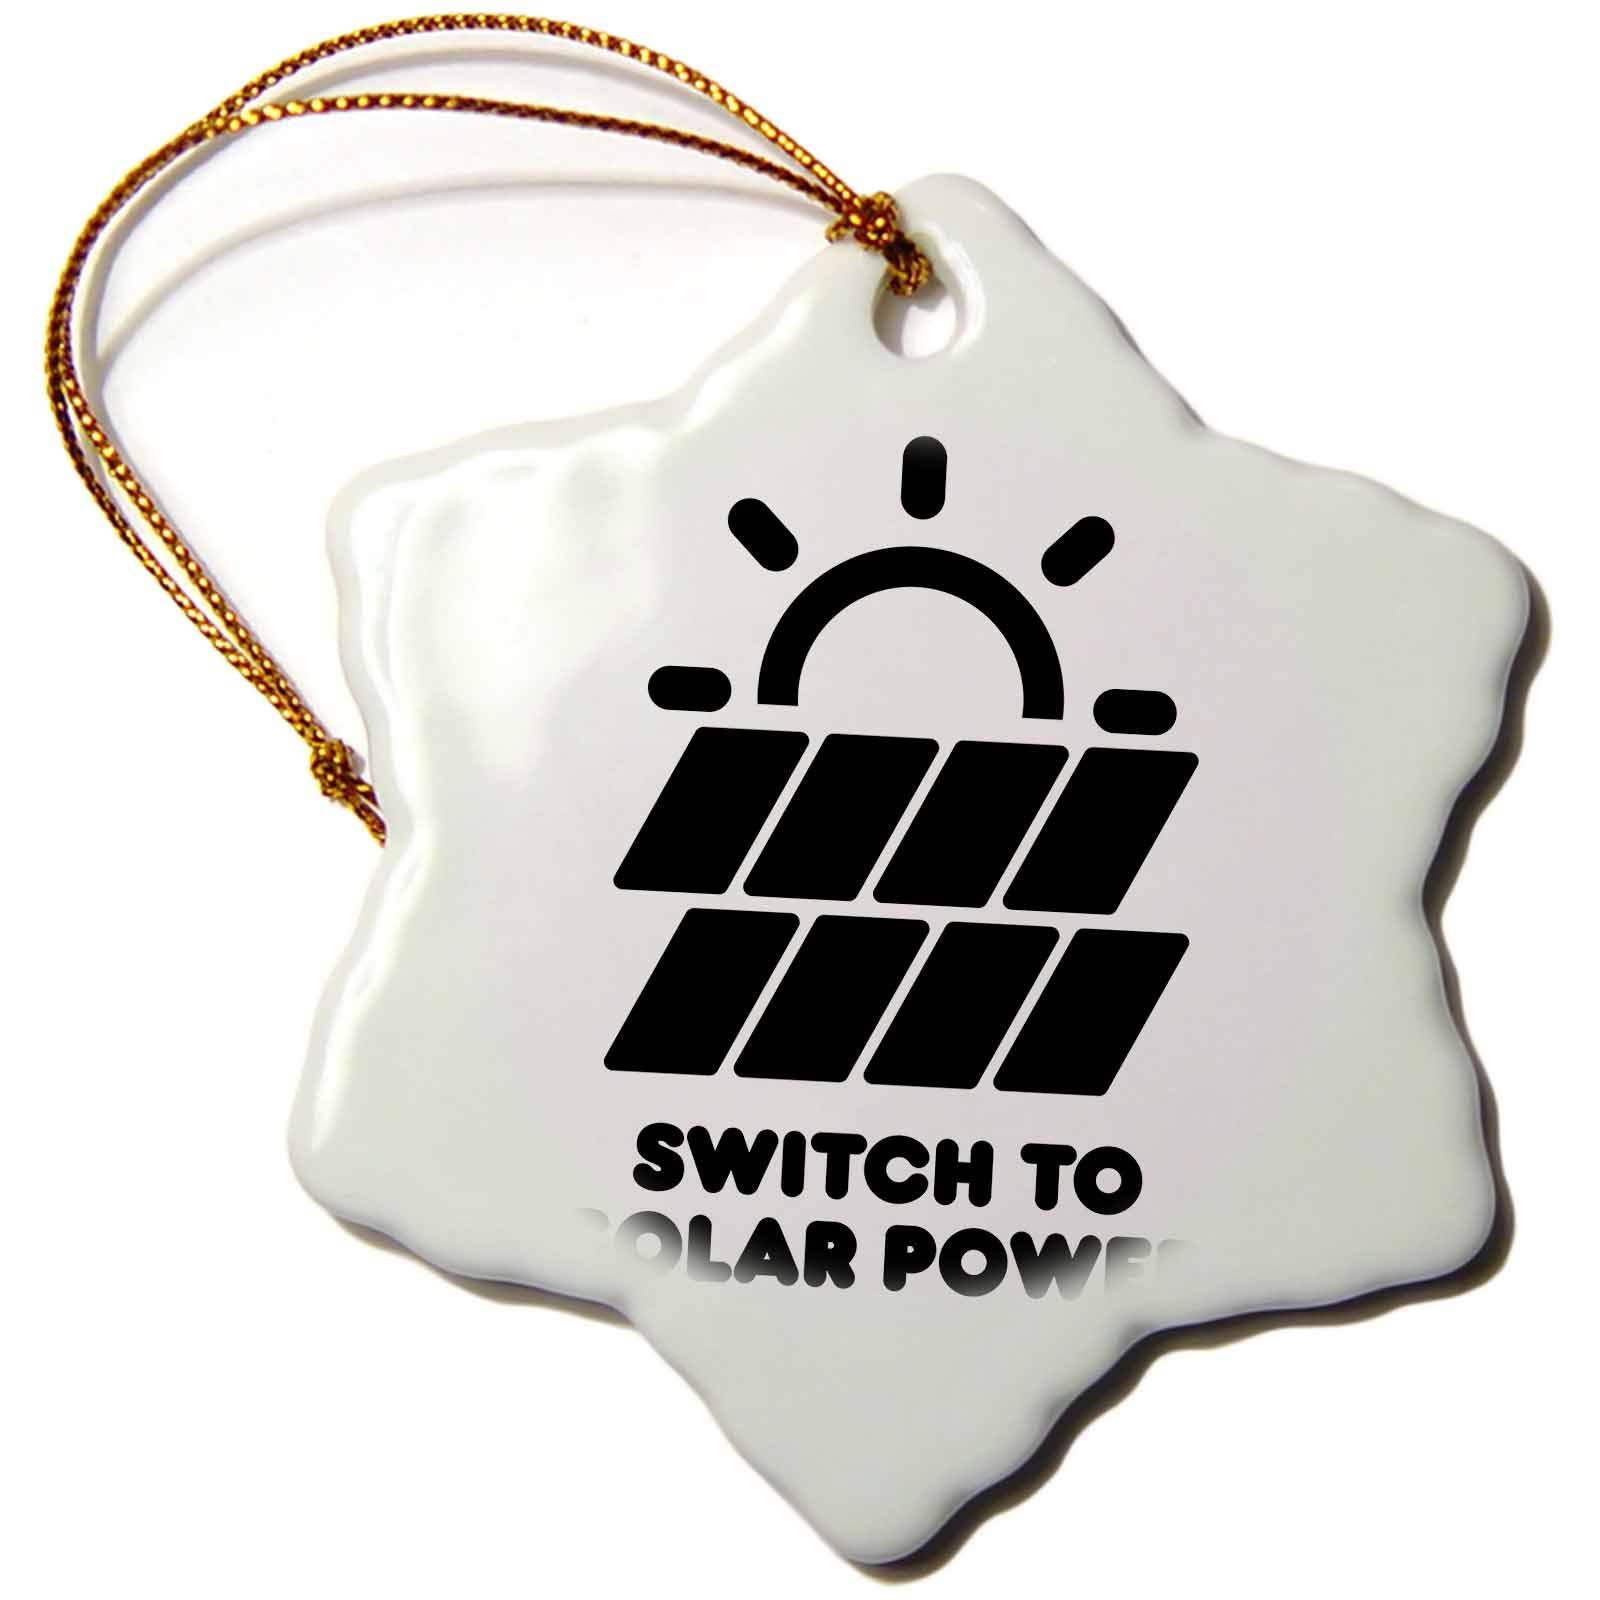 3dRose Carsten Reisinger - Illustrations - Switch to Solar Power Electric Power from The Sun Alternative Energy - 3 inch Snowflake Porcelain Ornament (ORN_294721_1)